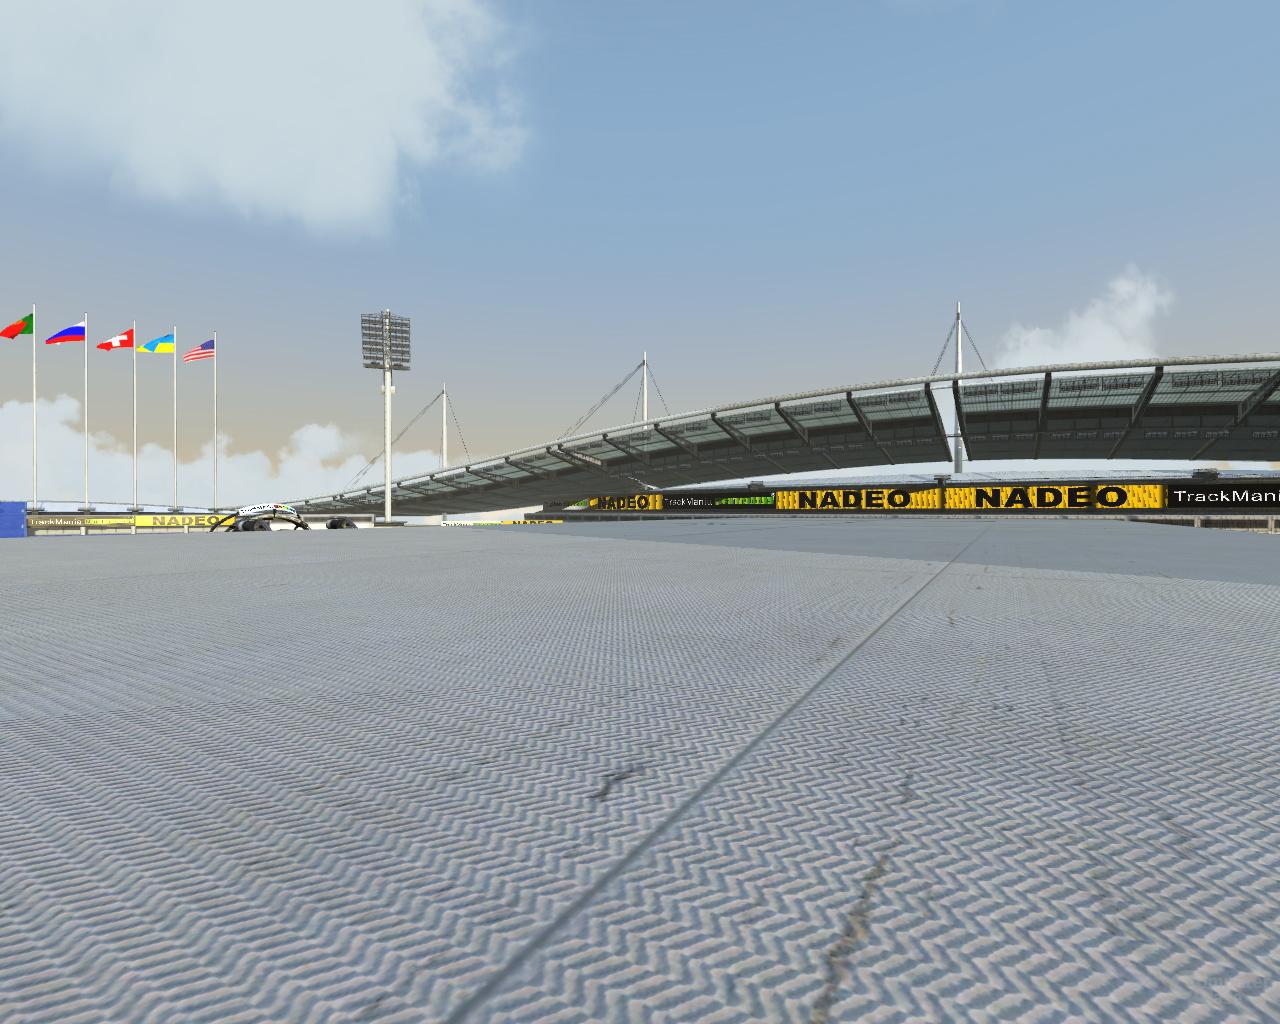 ATi RV870 Trackmania - 16xHQAF